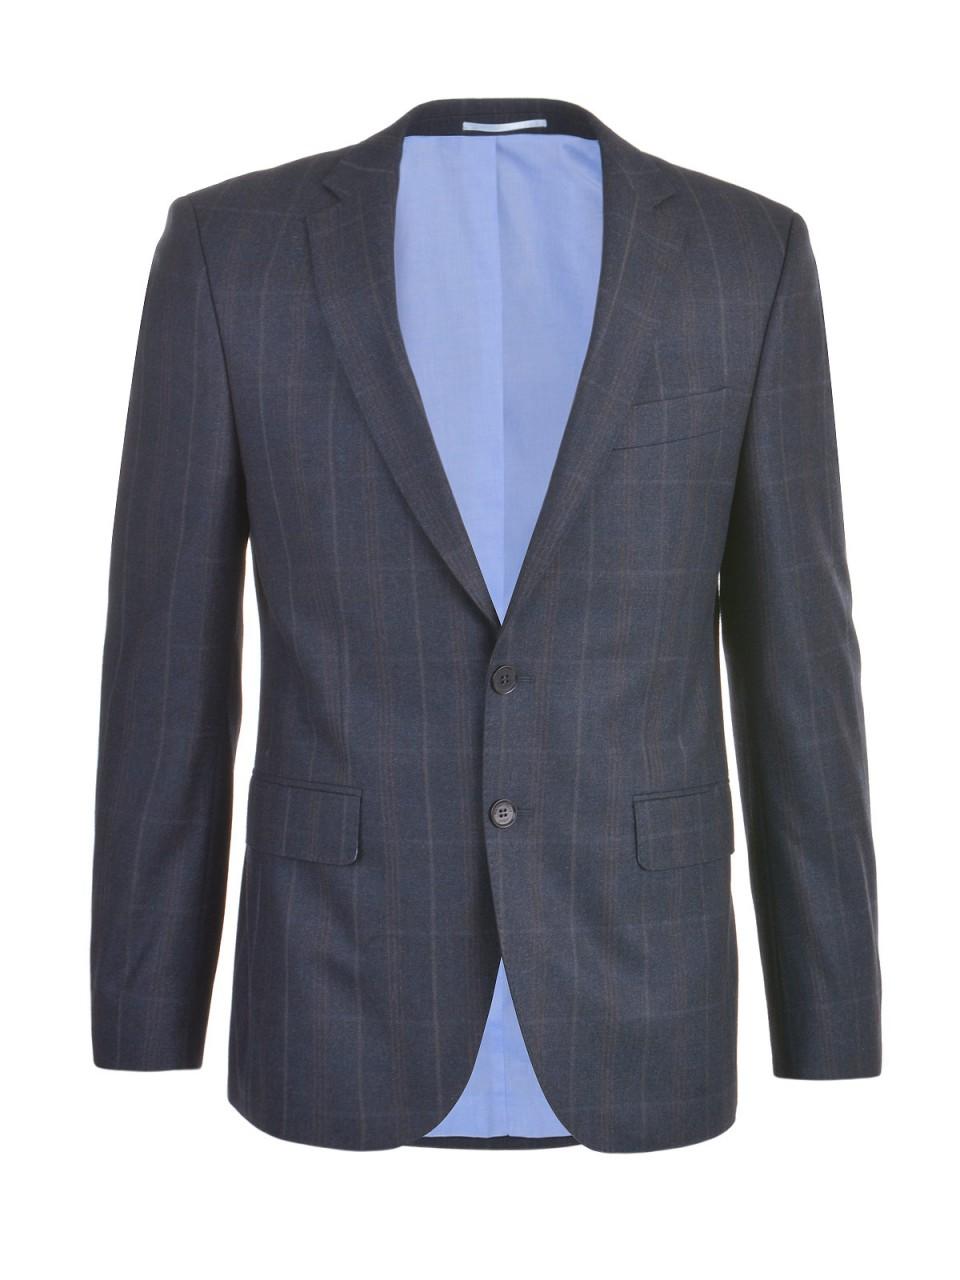 milano-italy-herren-sakko-dunkelblau-braun